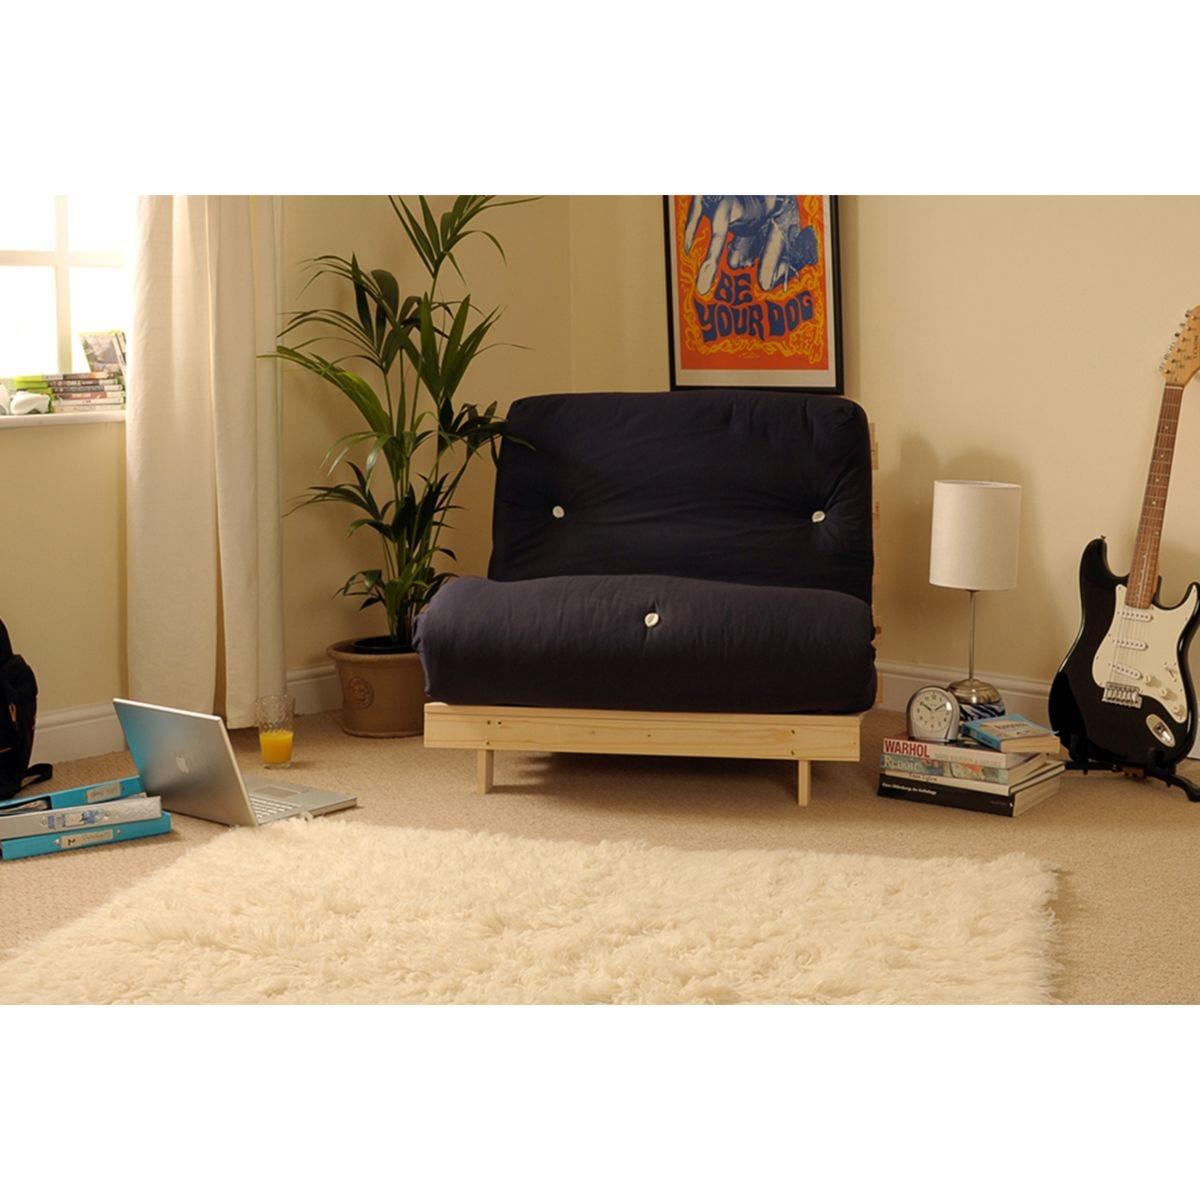 Albury Sofa Bed Set With Tufted Mattress - Black